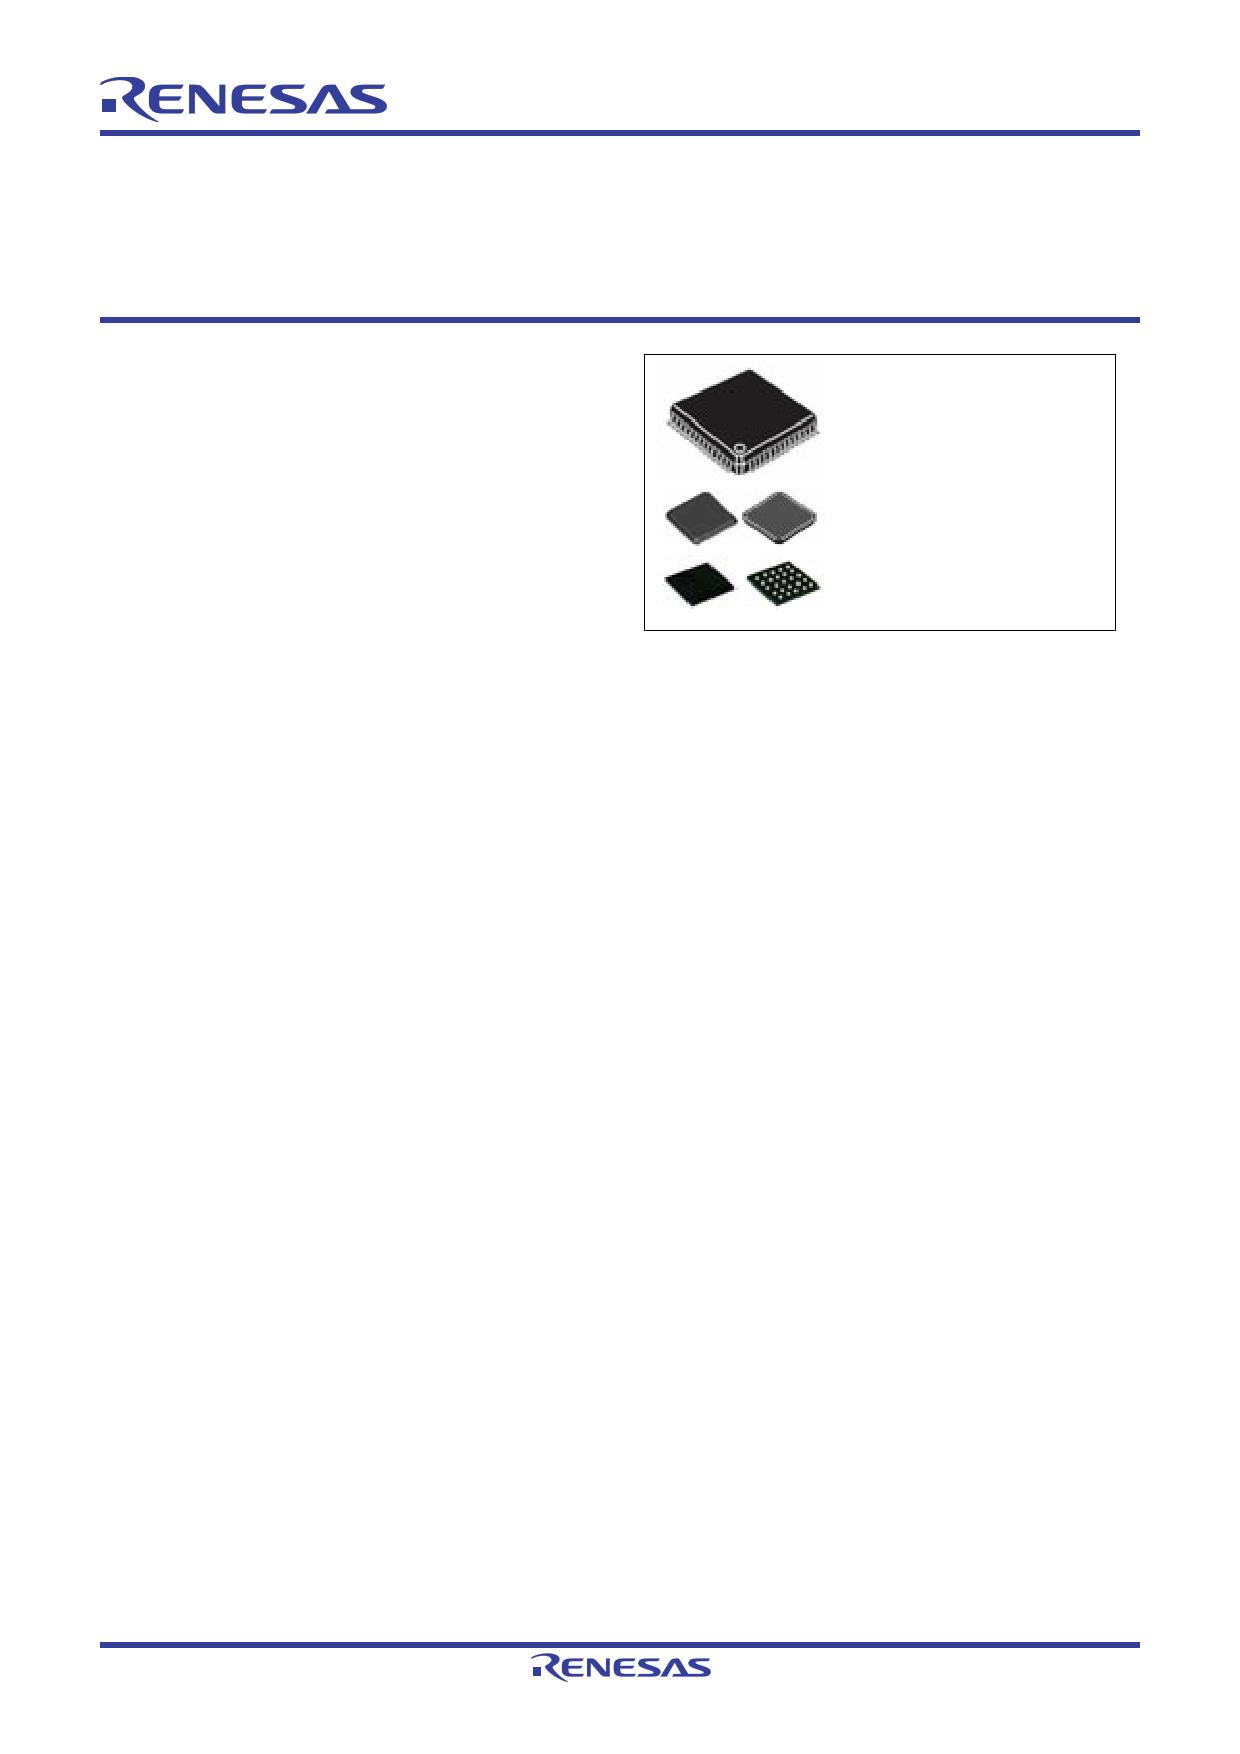 R5F51101AGFL 데이터시트 및 R5F51101AGFL PDF